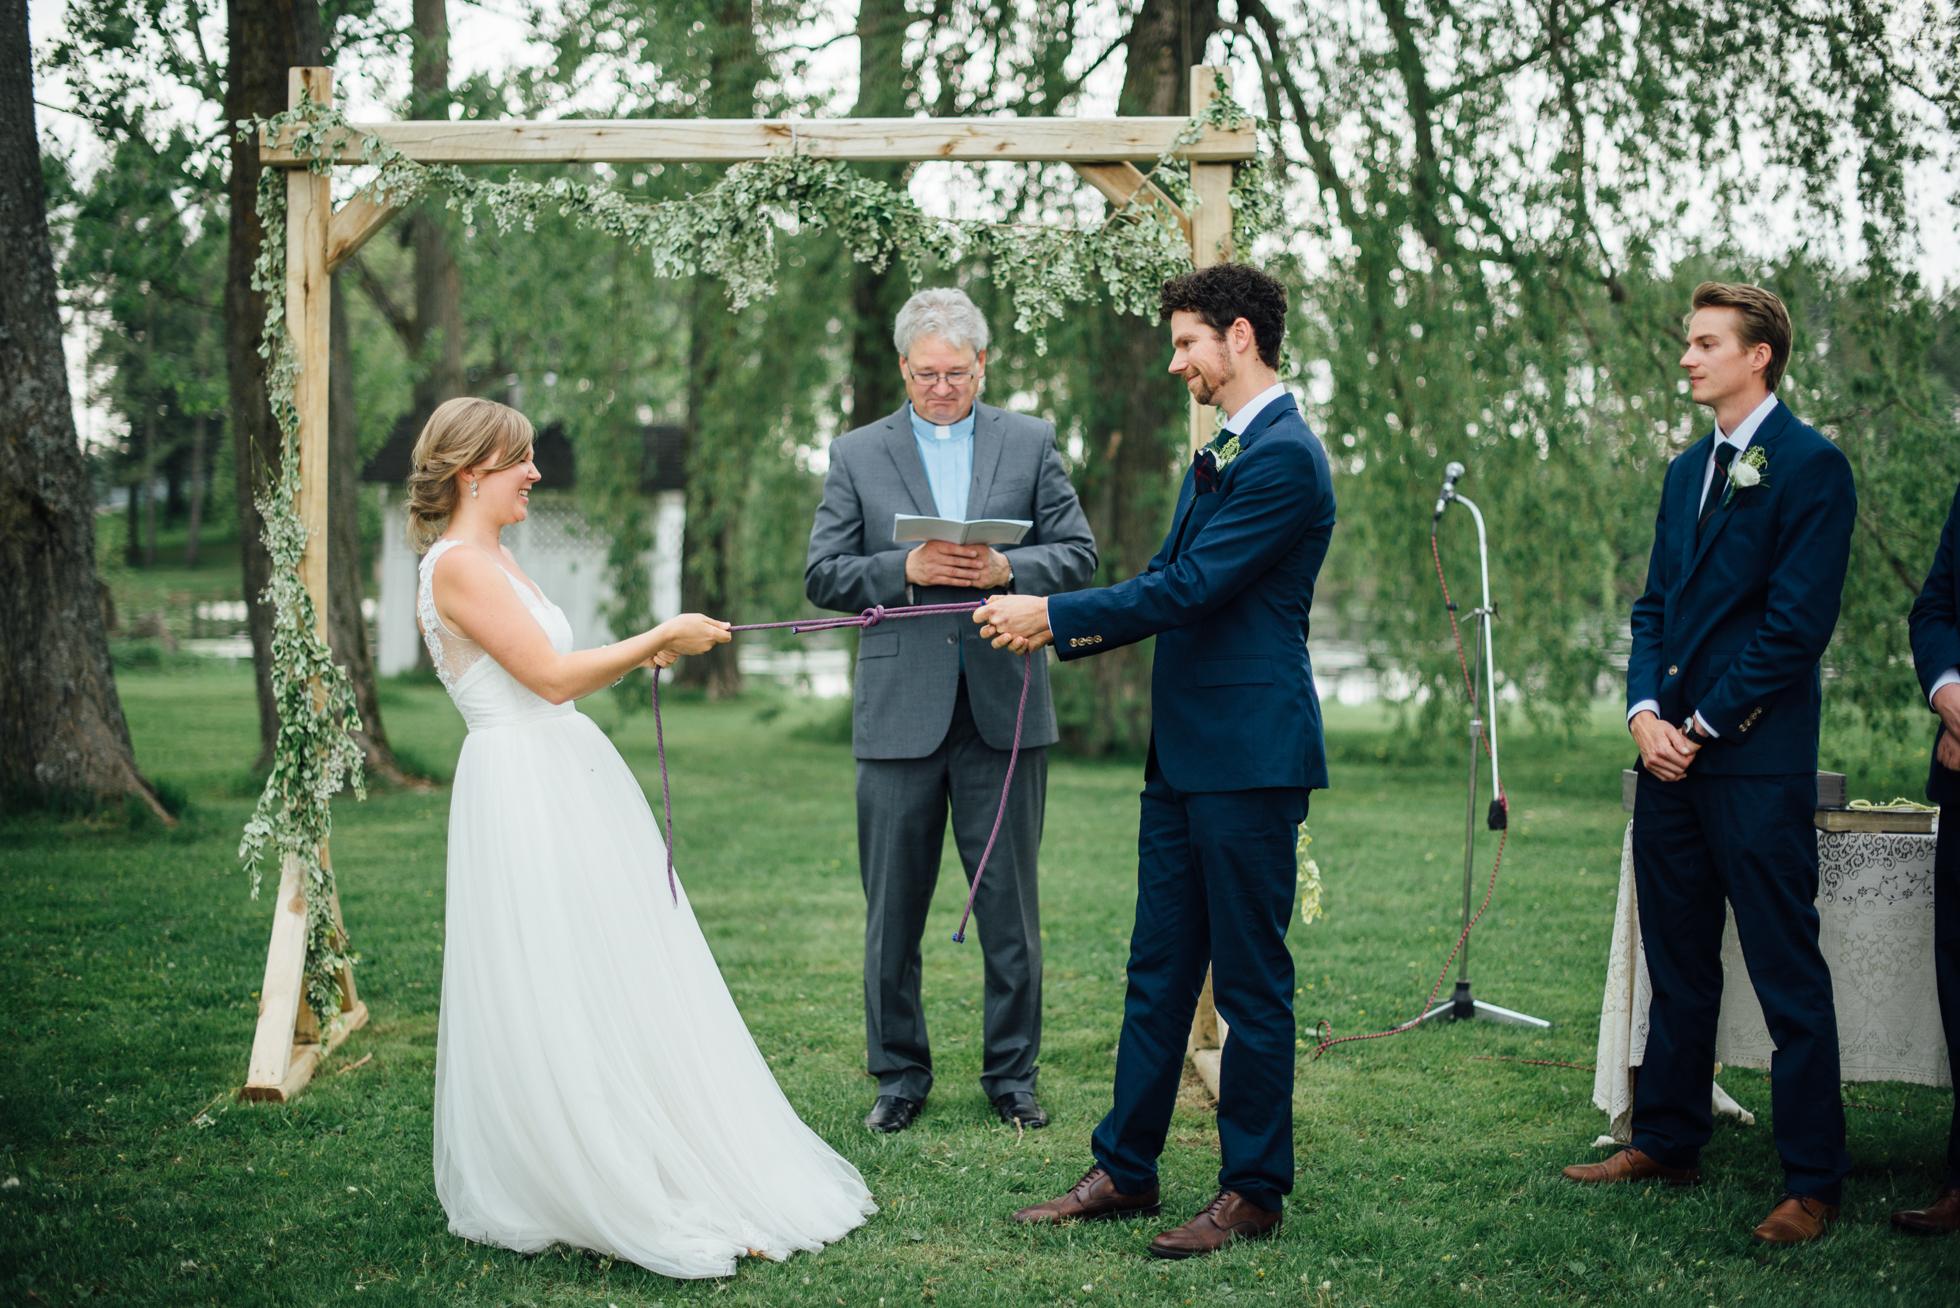 Outdoor-Caledon-Tralee-Wedding-Photography-62